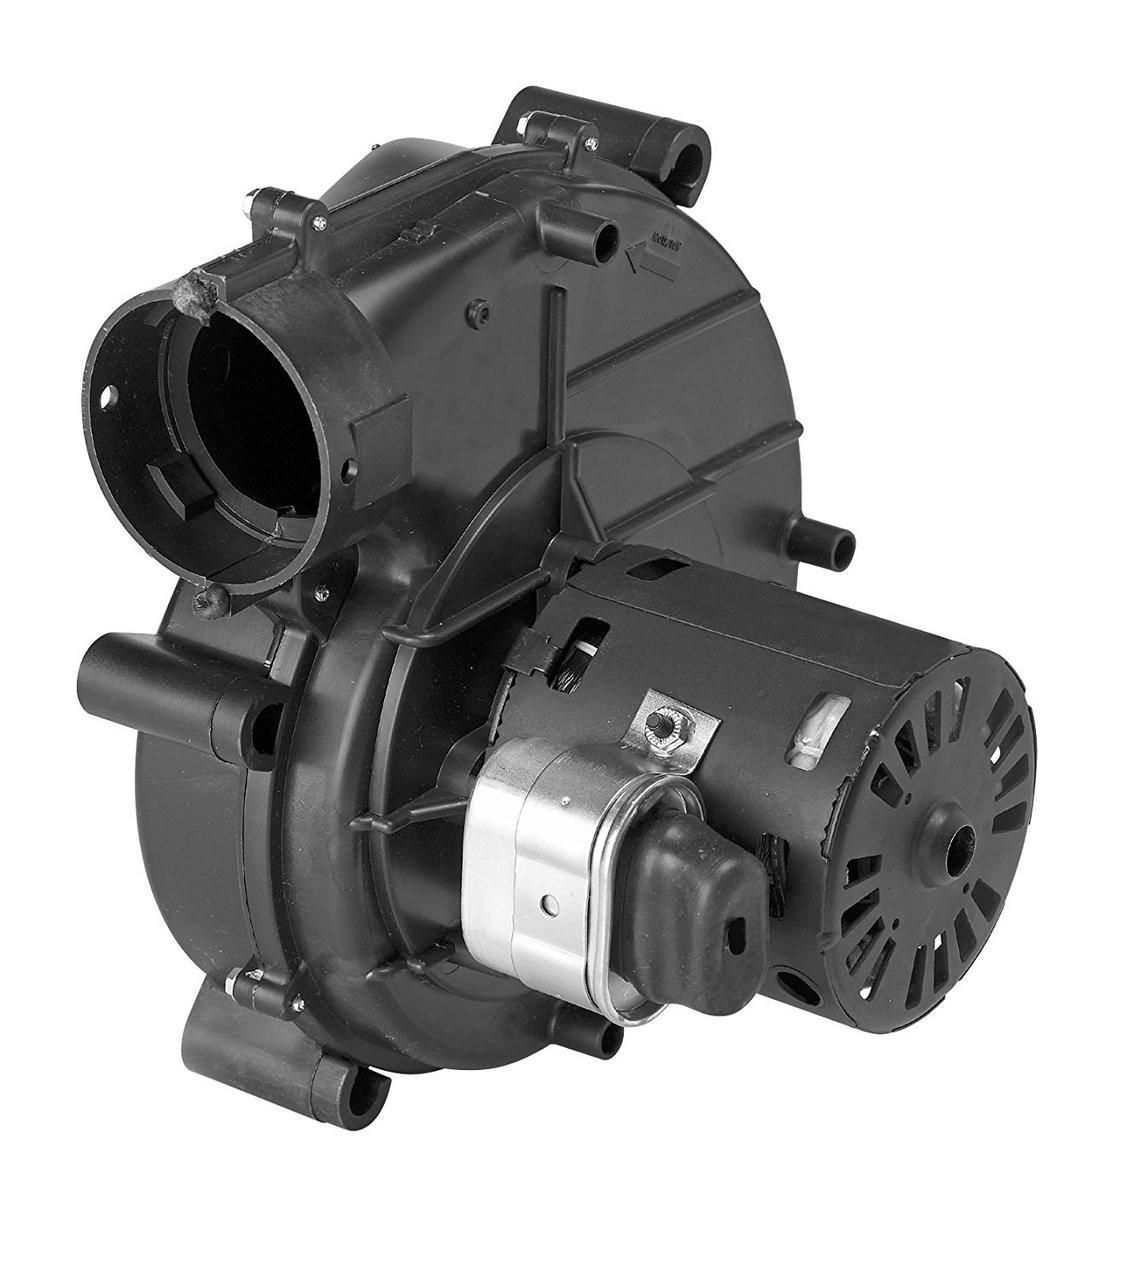 York Ducane Furnace Draft Inducer( 7062-5019 7062-3136) 115V Fasco # A168  sc 1 st  Electric Motor Warehouse : ducane furnace wiring diagram - yogabreezes.com